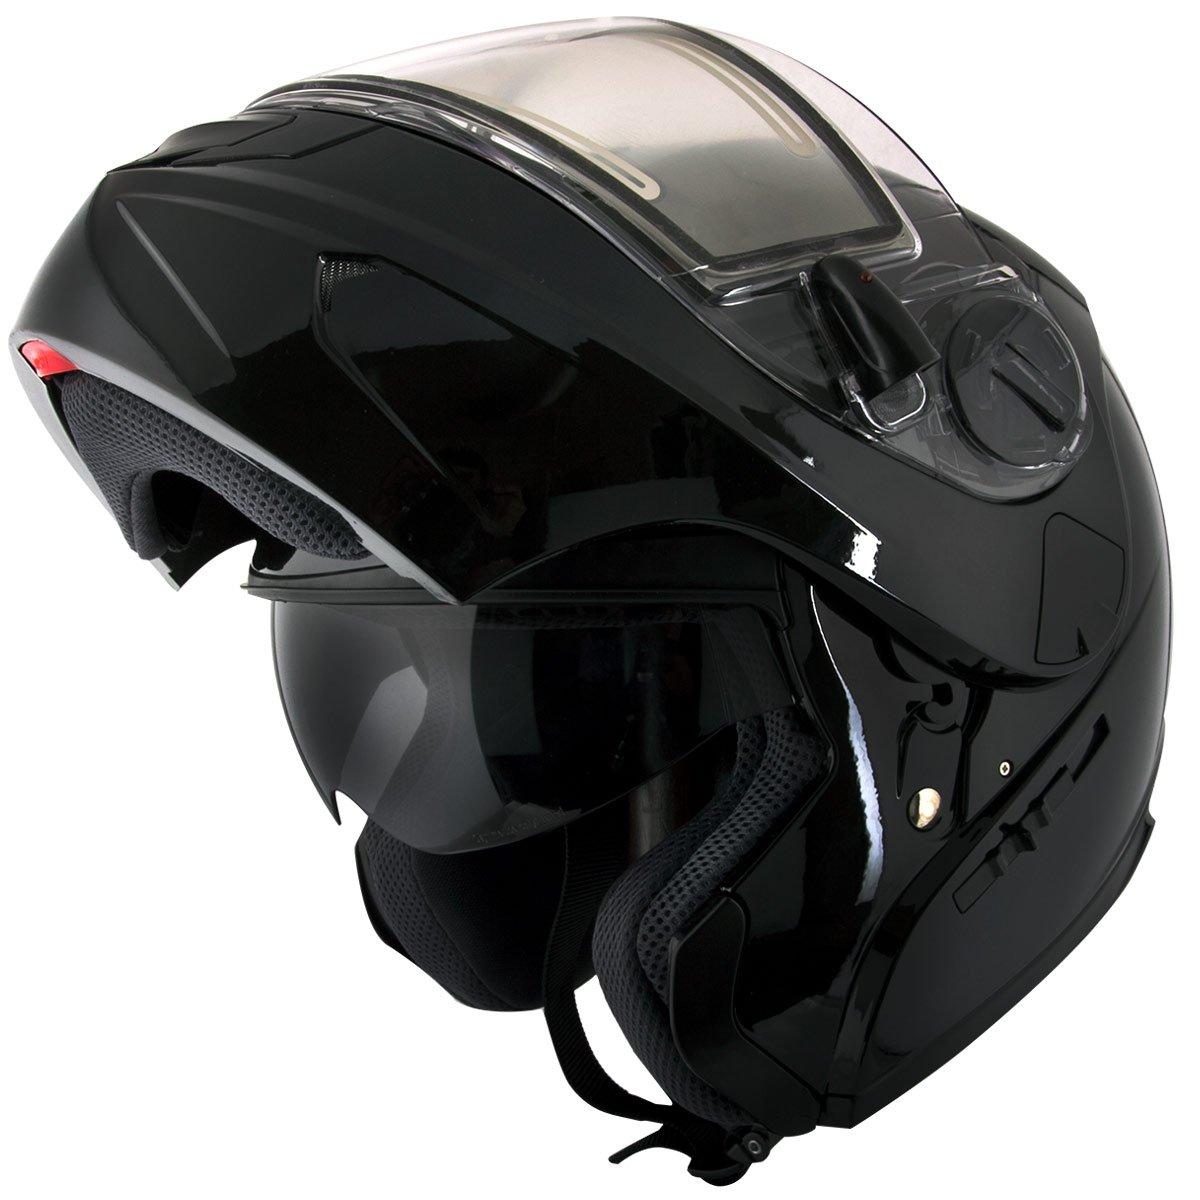 Snow Master TX-797S Glossy Black Modular Snowmobile Helmet - Small